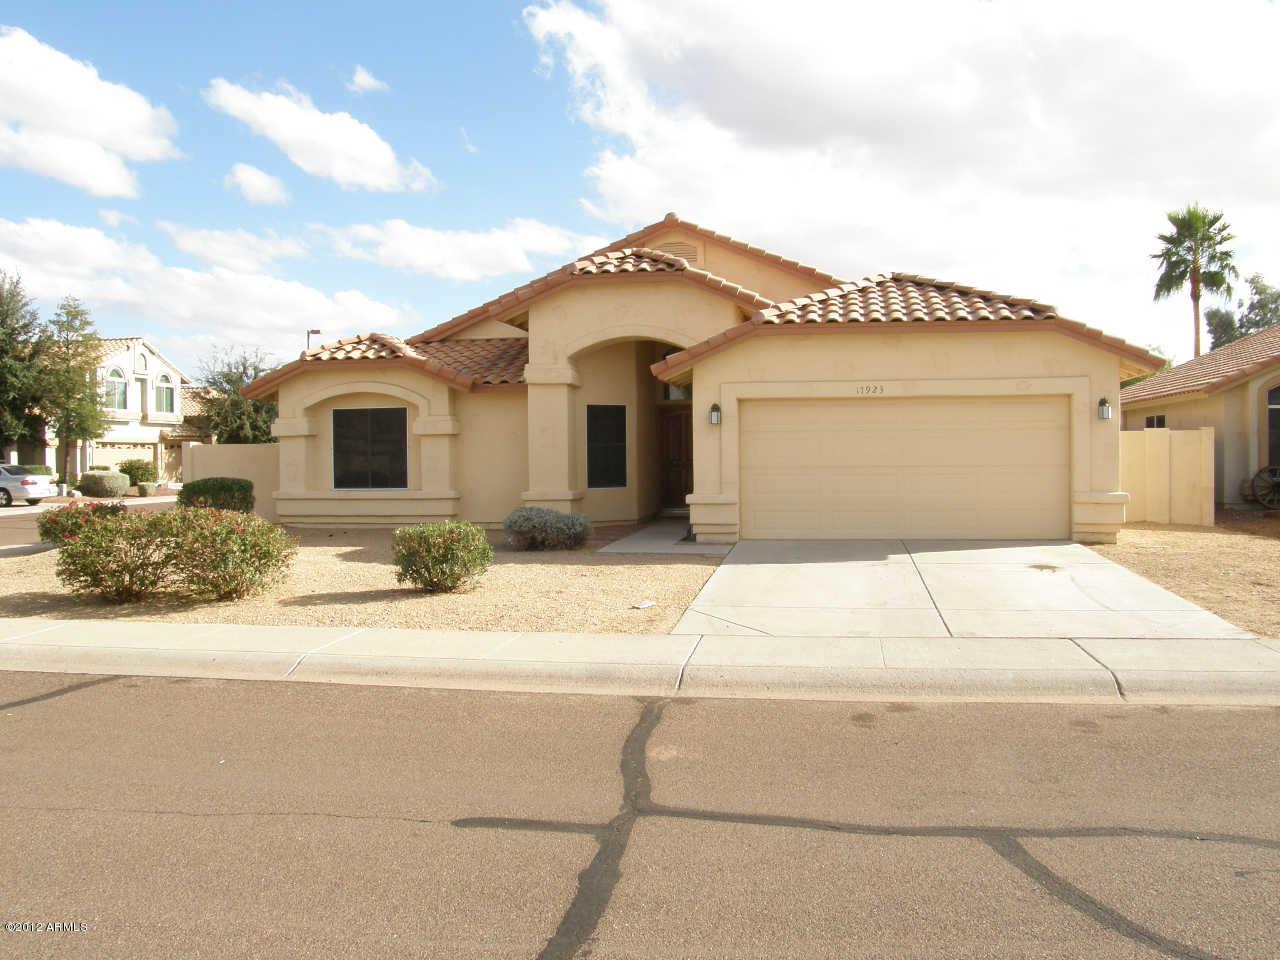 $259,999 - 3Br/2Ba - Home for Sale in Estrella Parcel 55, Goodyear